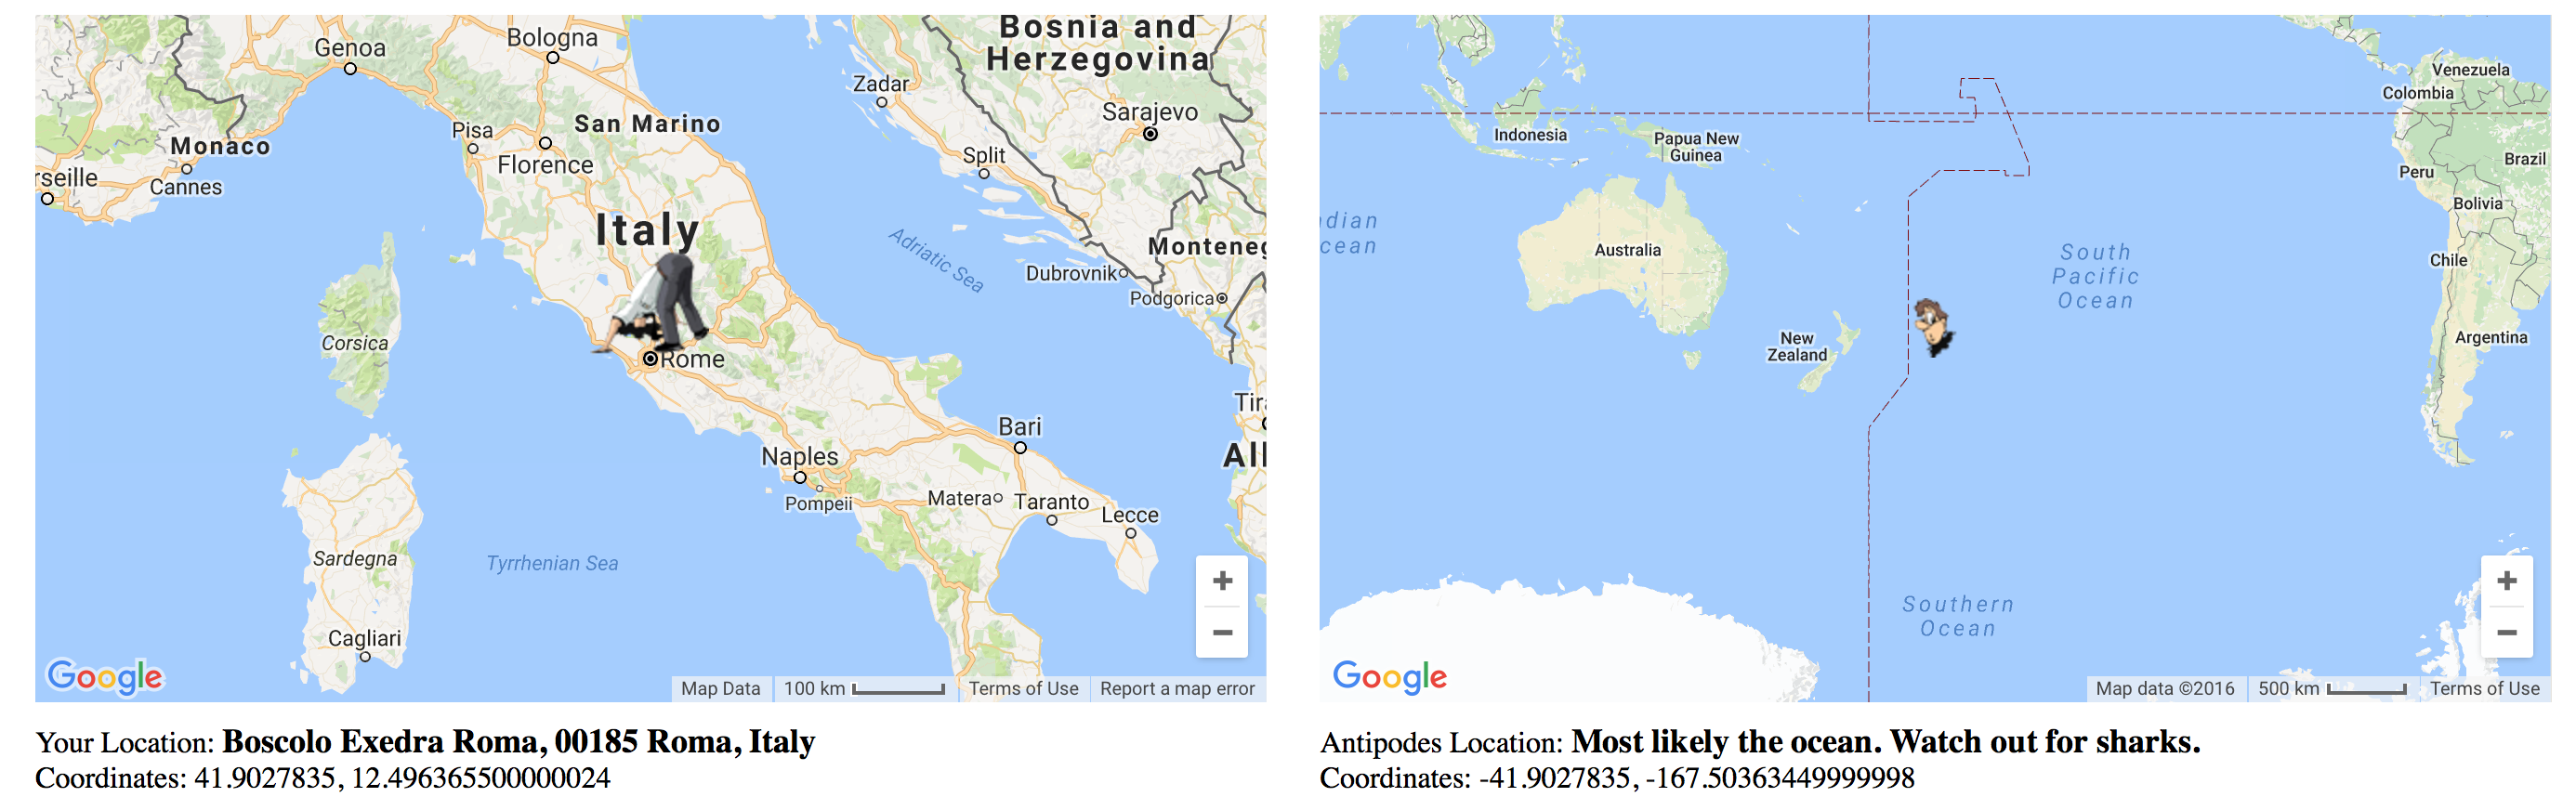 rome-to-antipodes-near-new-zealand